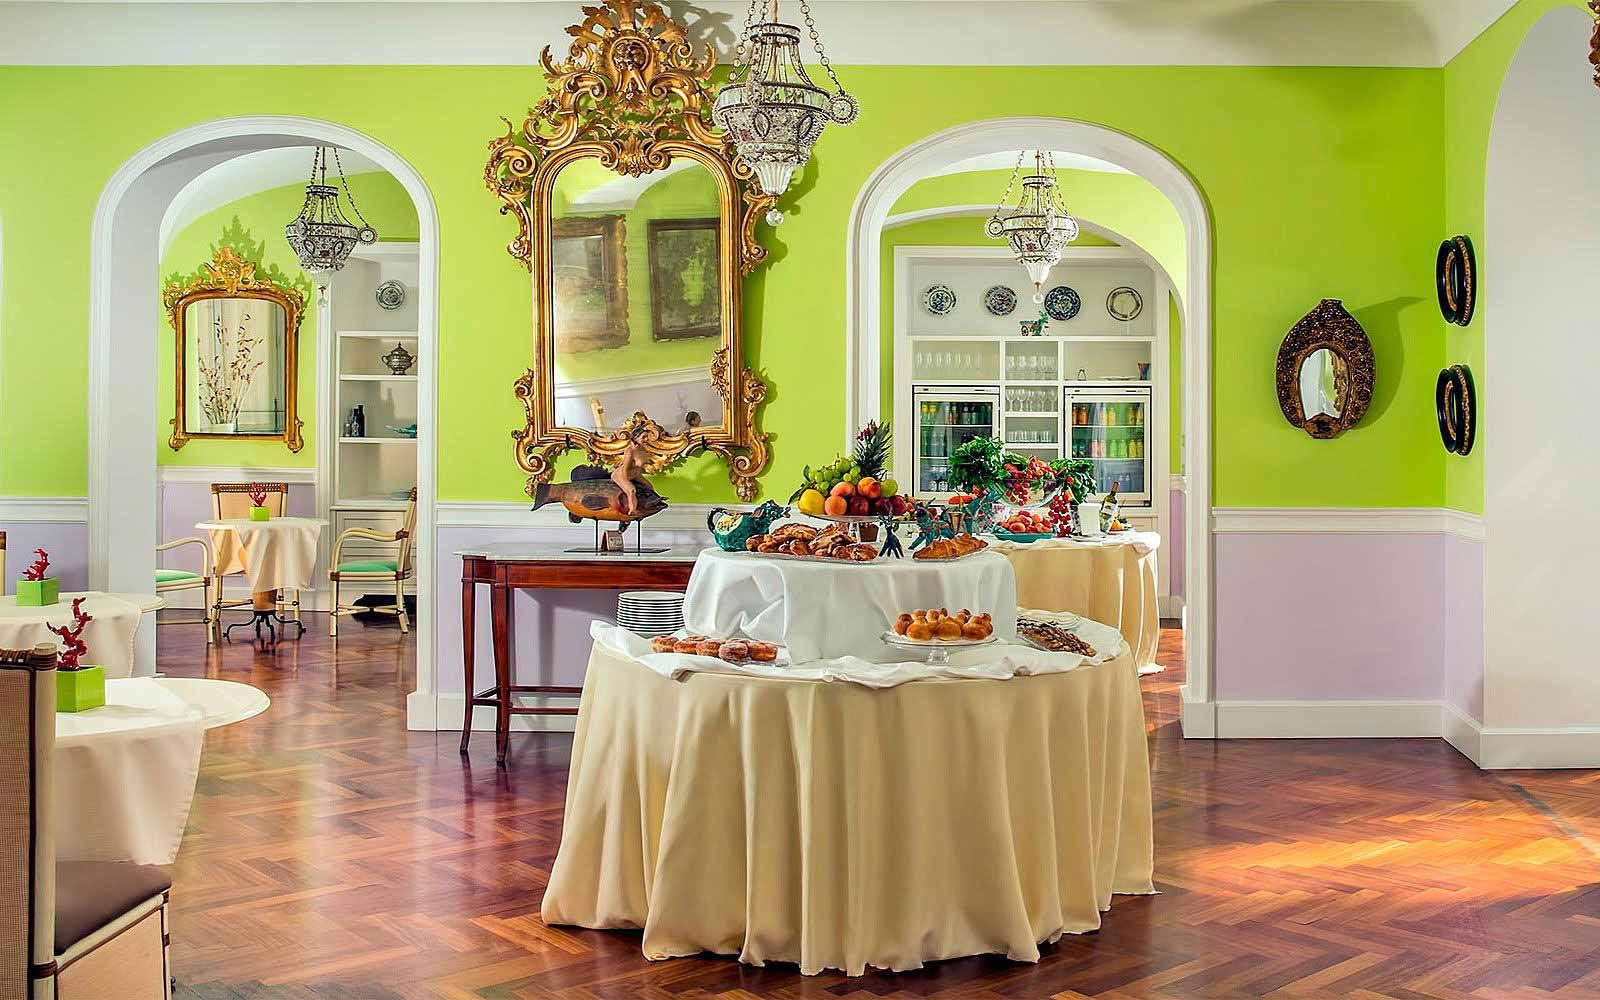 Gli Archi Restaurant at Hotel Bellevue Syrene